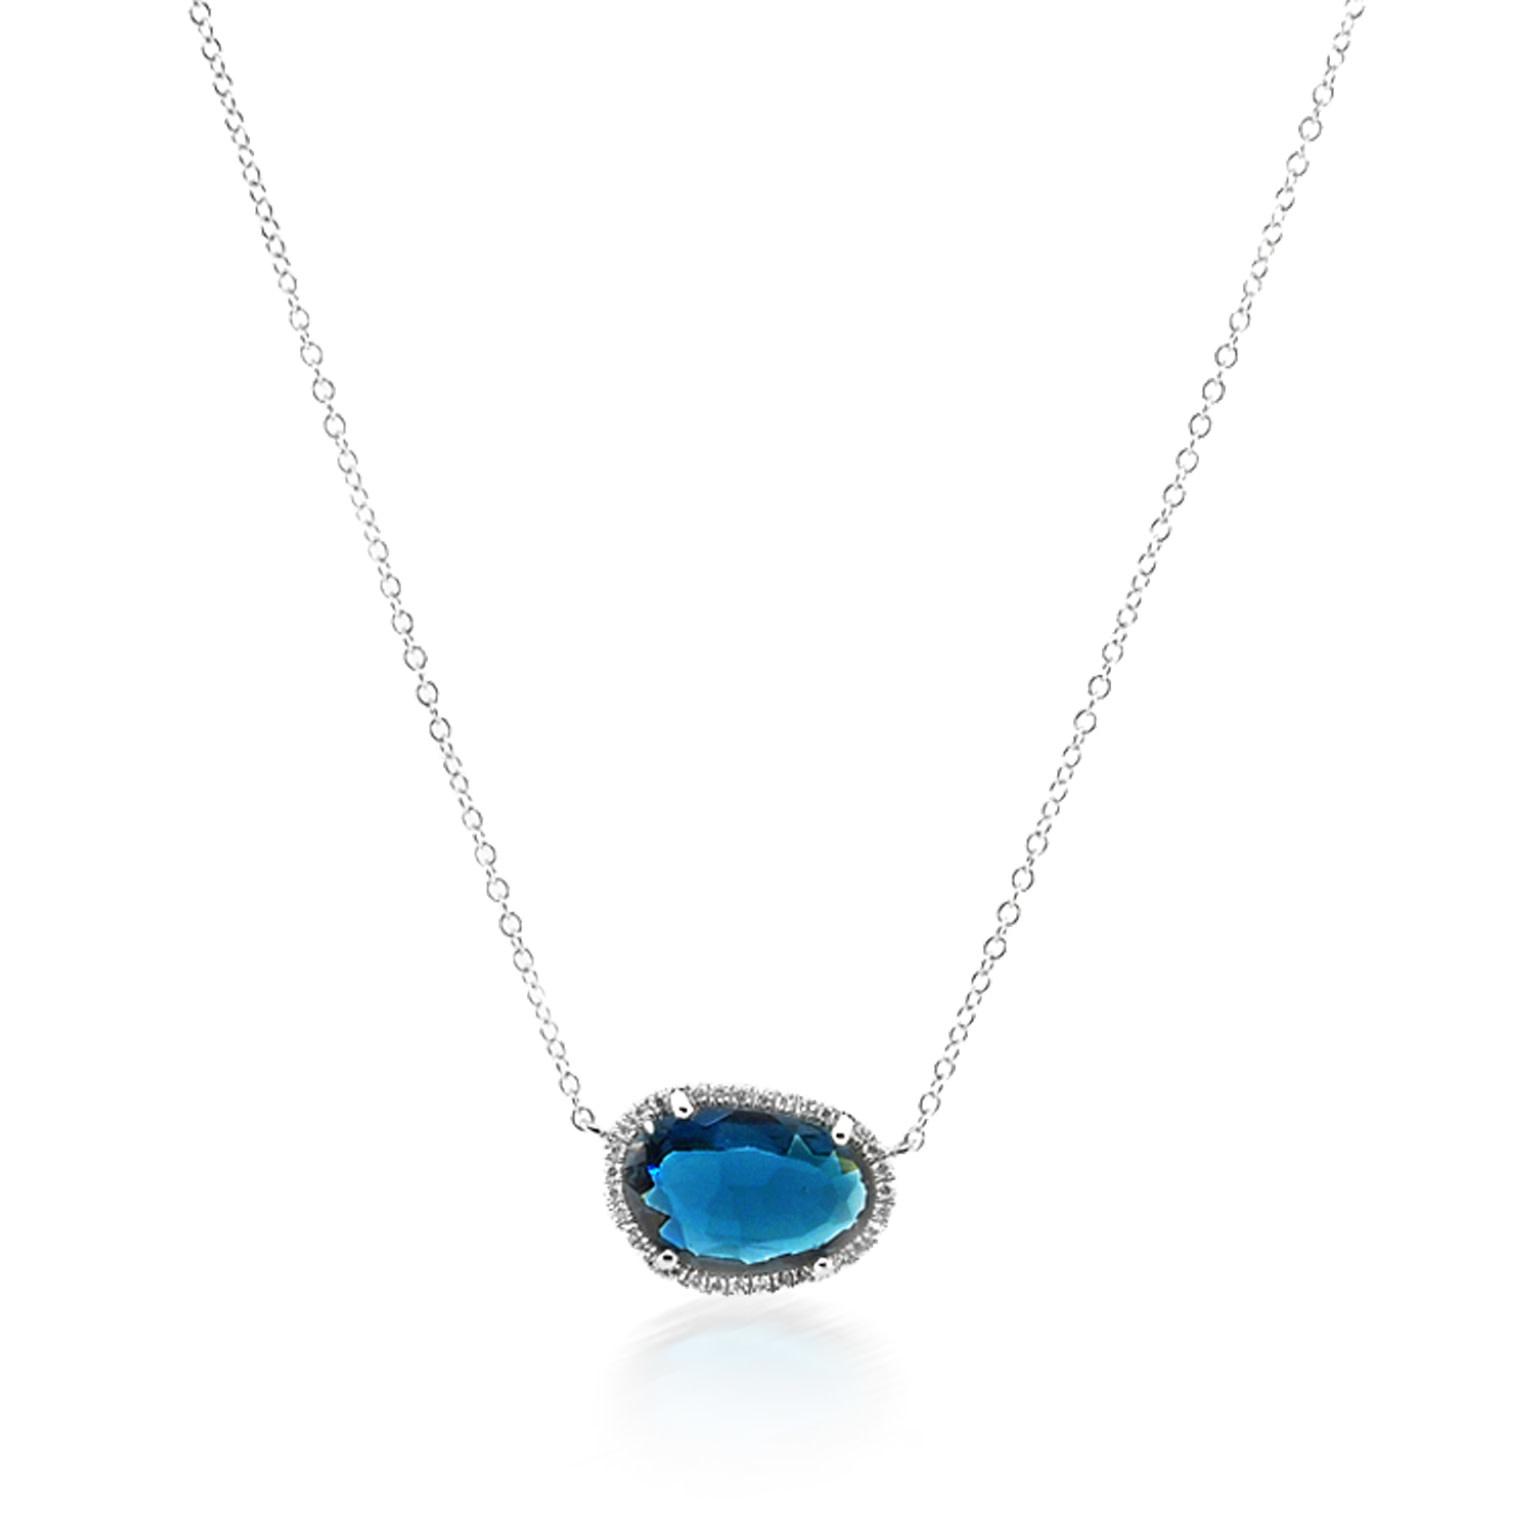 Asymmetrical London Blue Topaz Necklace